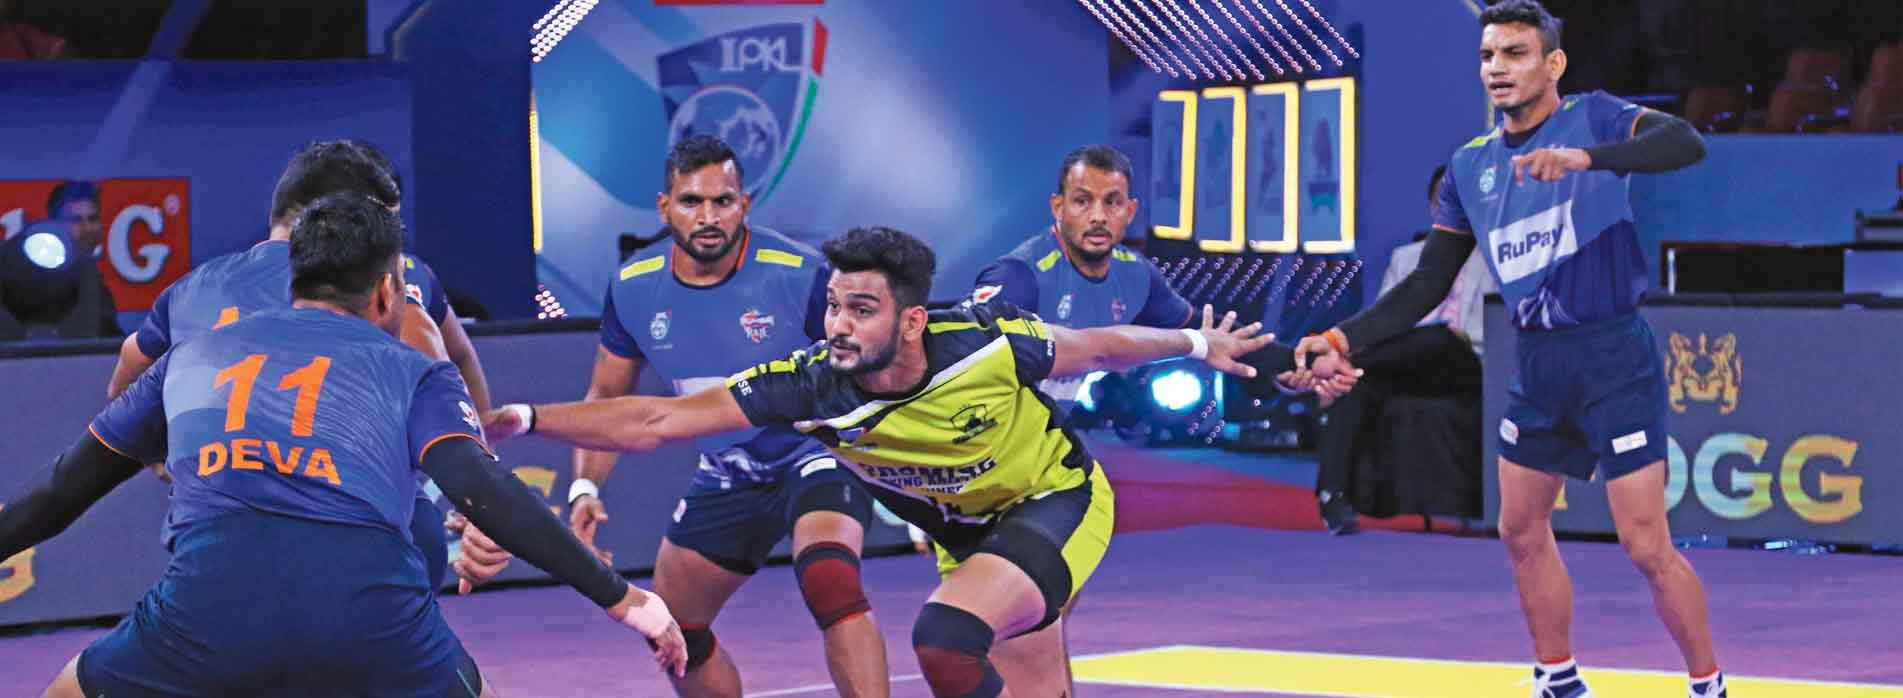 Kabaddi league gets a shake up